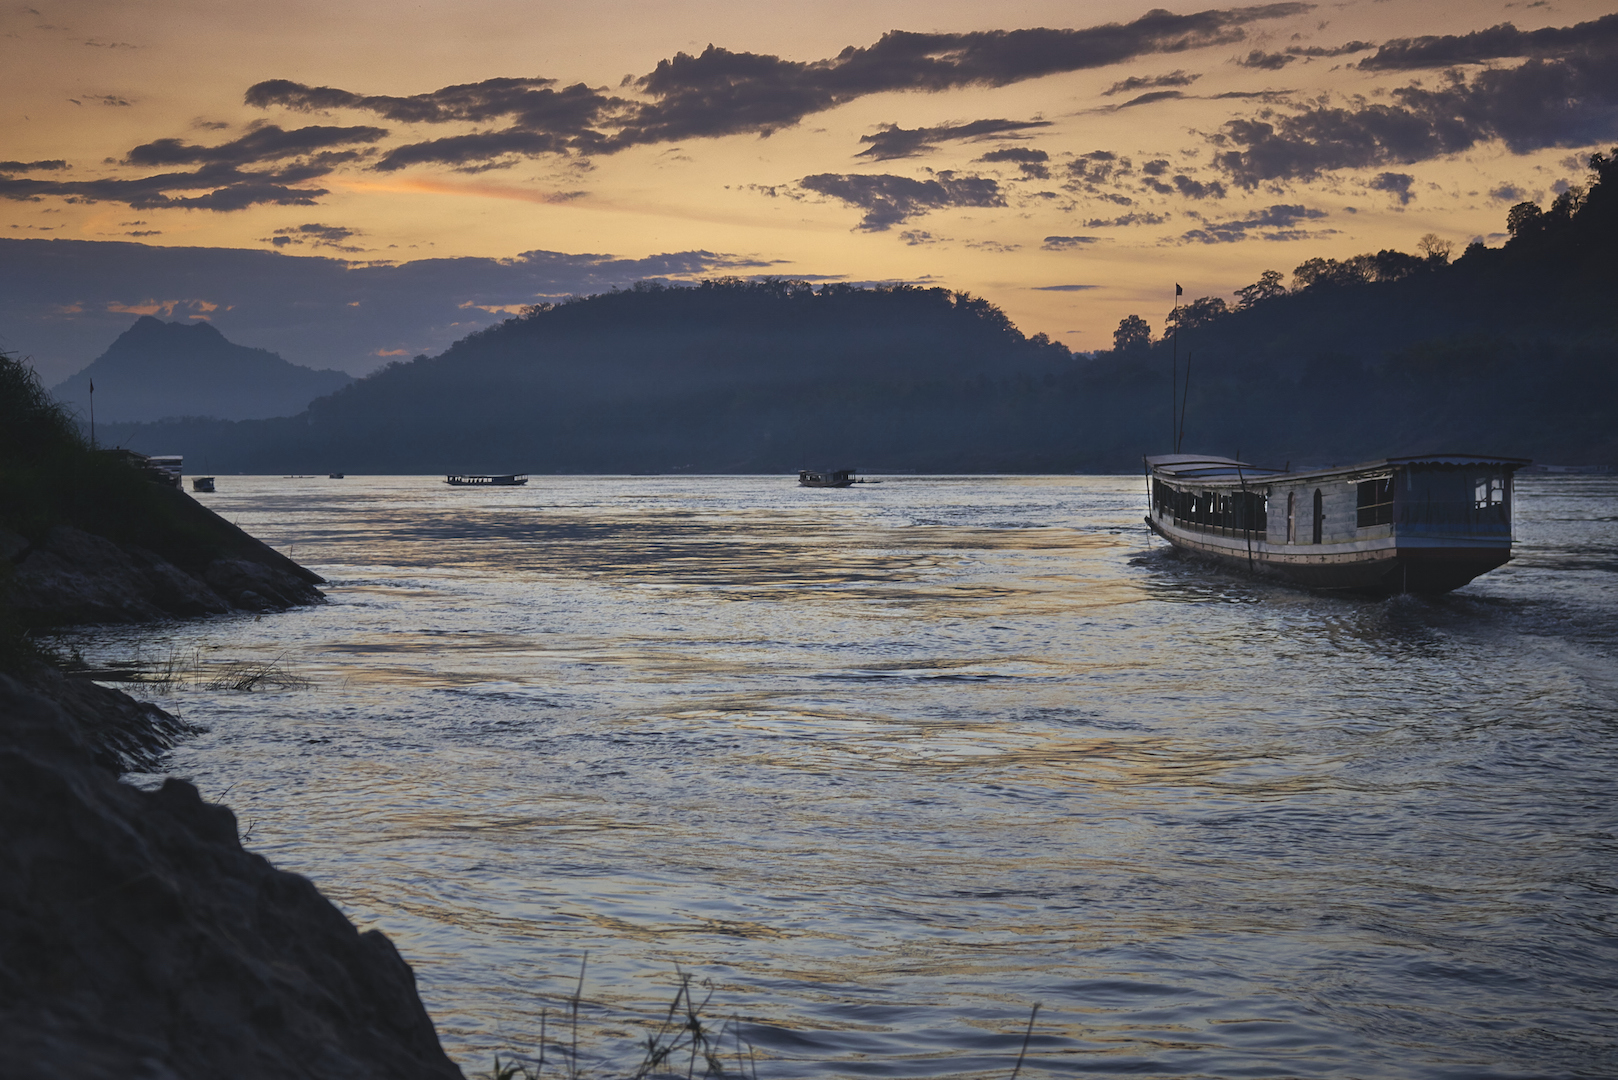 Khasar_S_SunsetSlowBoat_LuangPrabang_Laos_Winter_2014.jpg